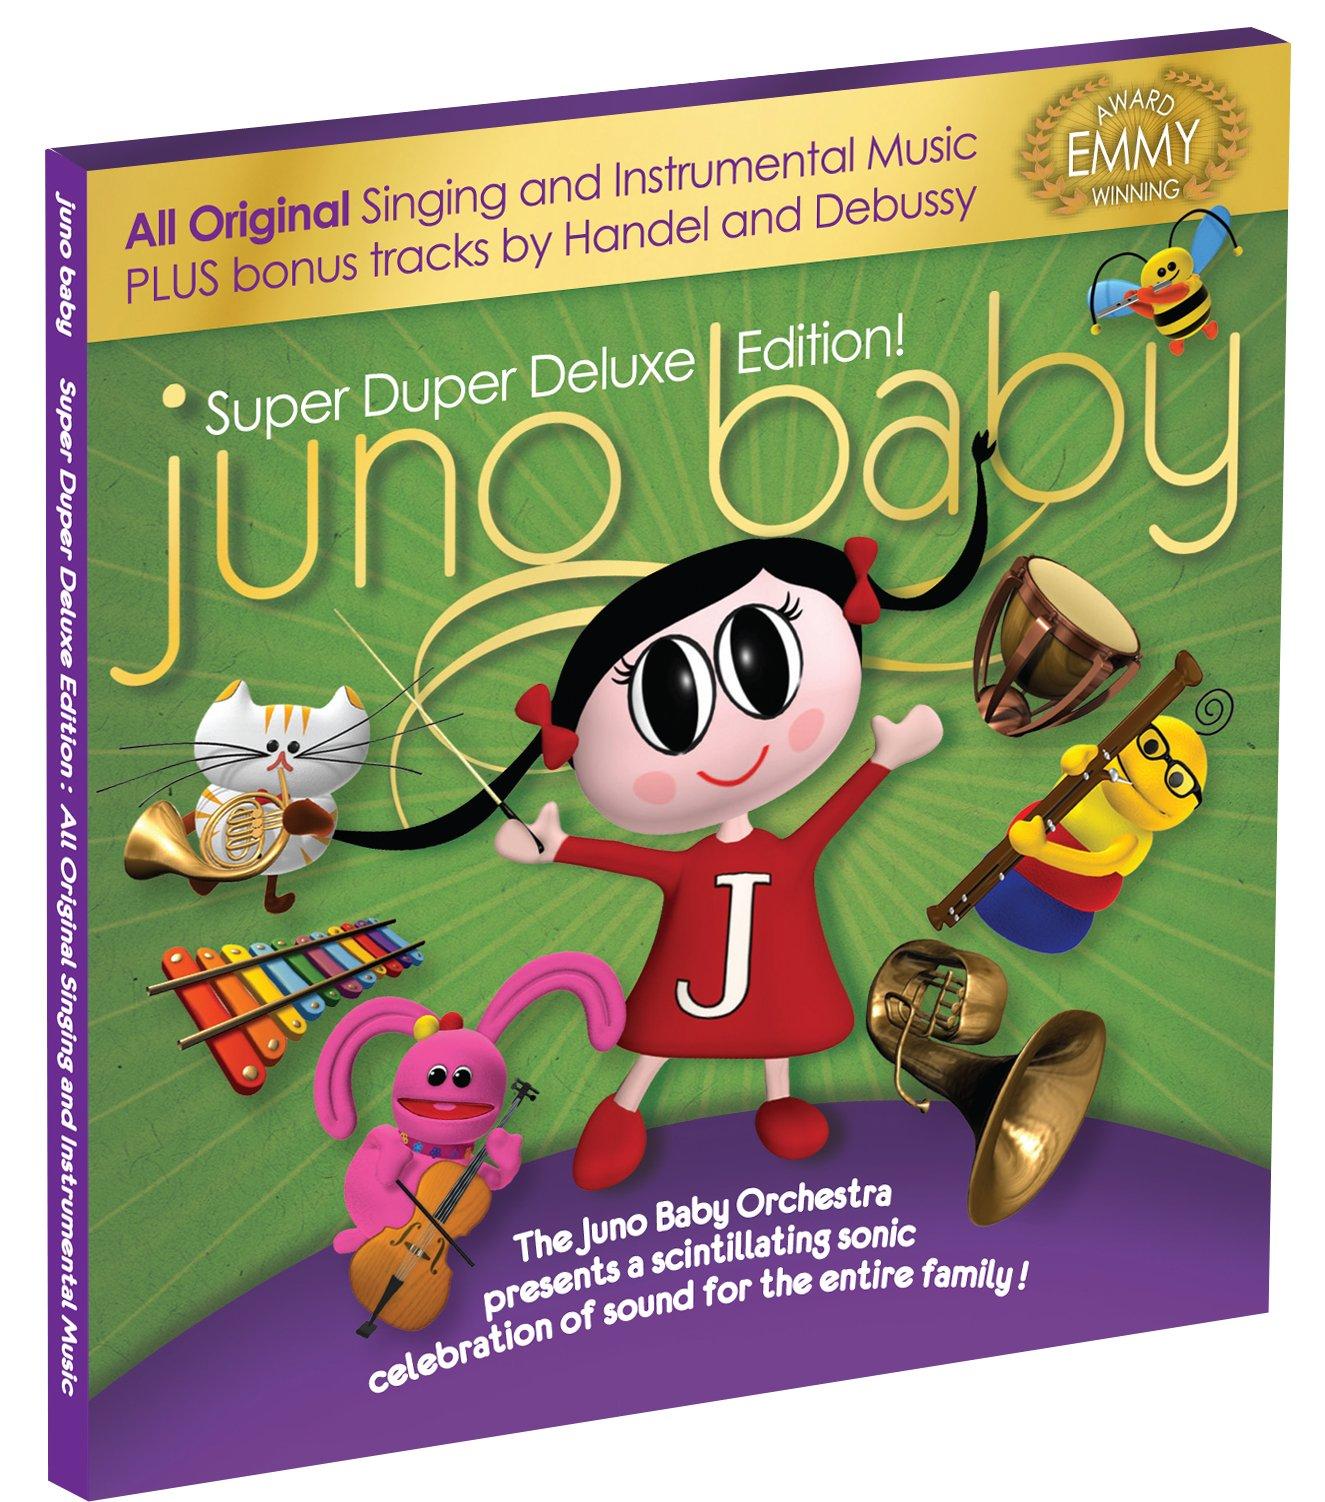 Juno Baby151;  Super Duper Deluxe Edition